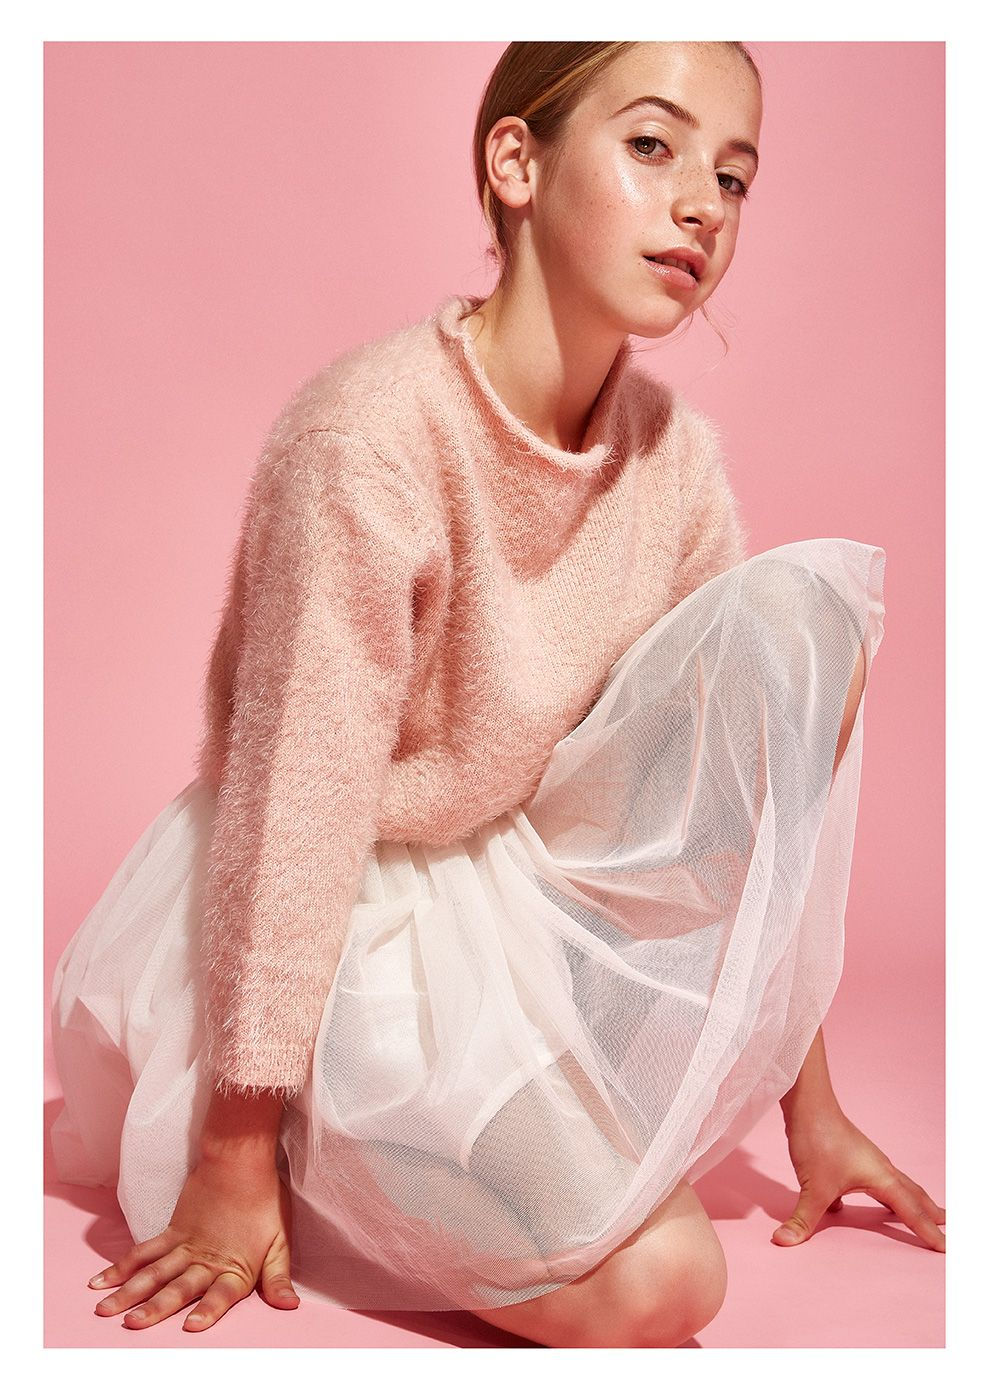 Pink mood by Vika Pobeda #vikapobeda #pobedavika #pink #beauty ...